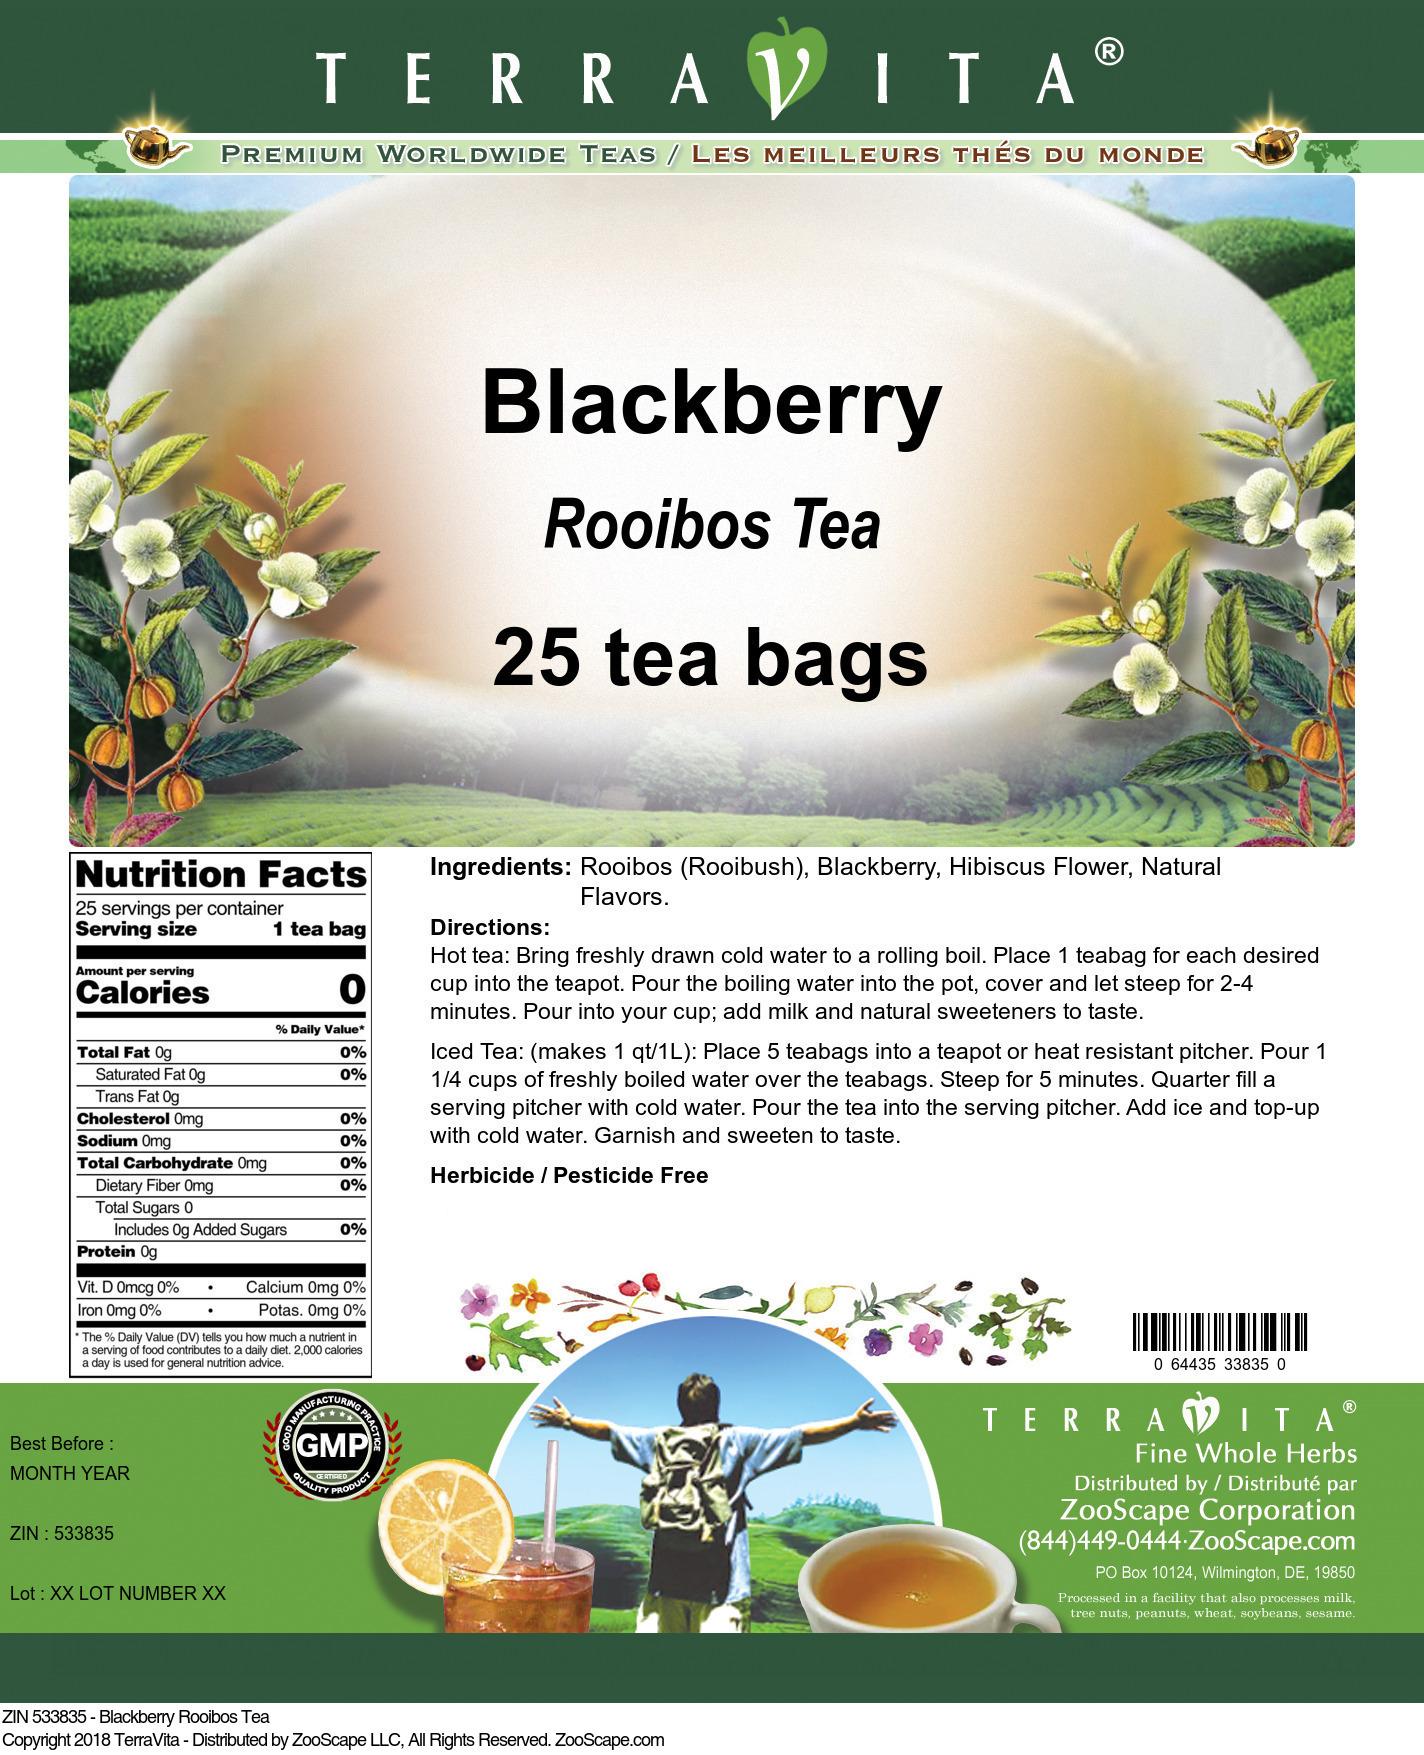 Blackberry Rooibos Tea